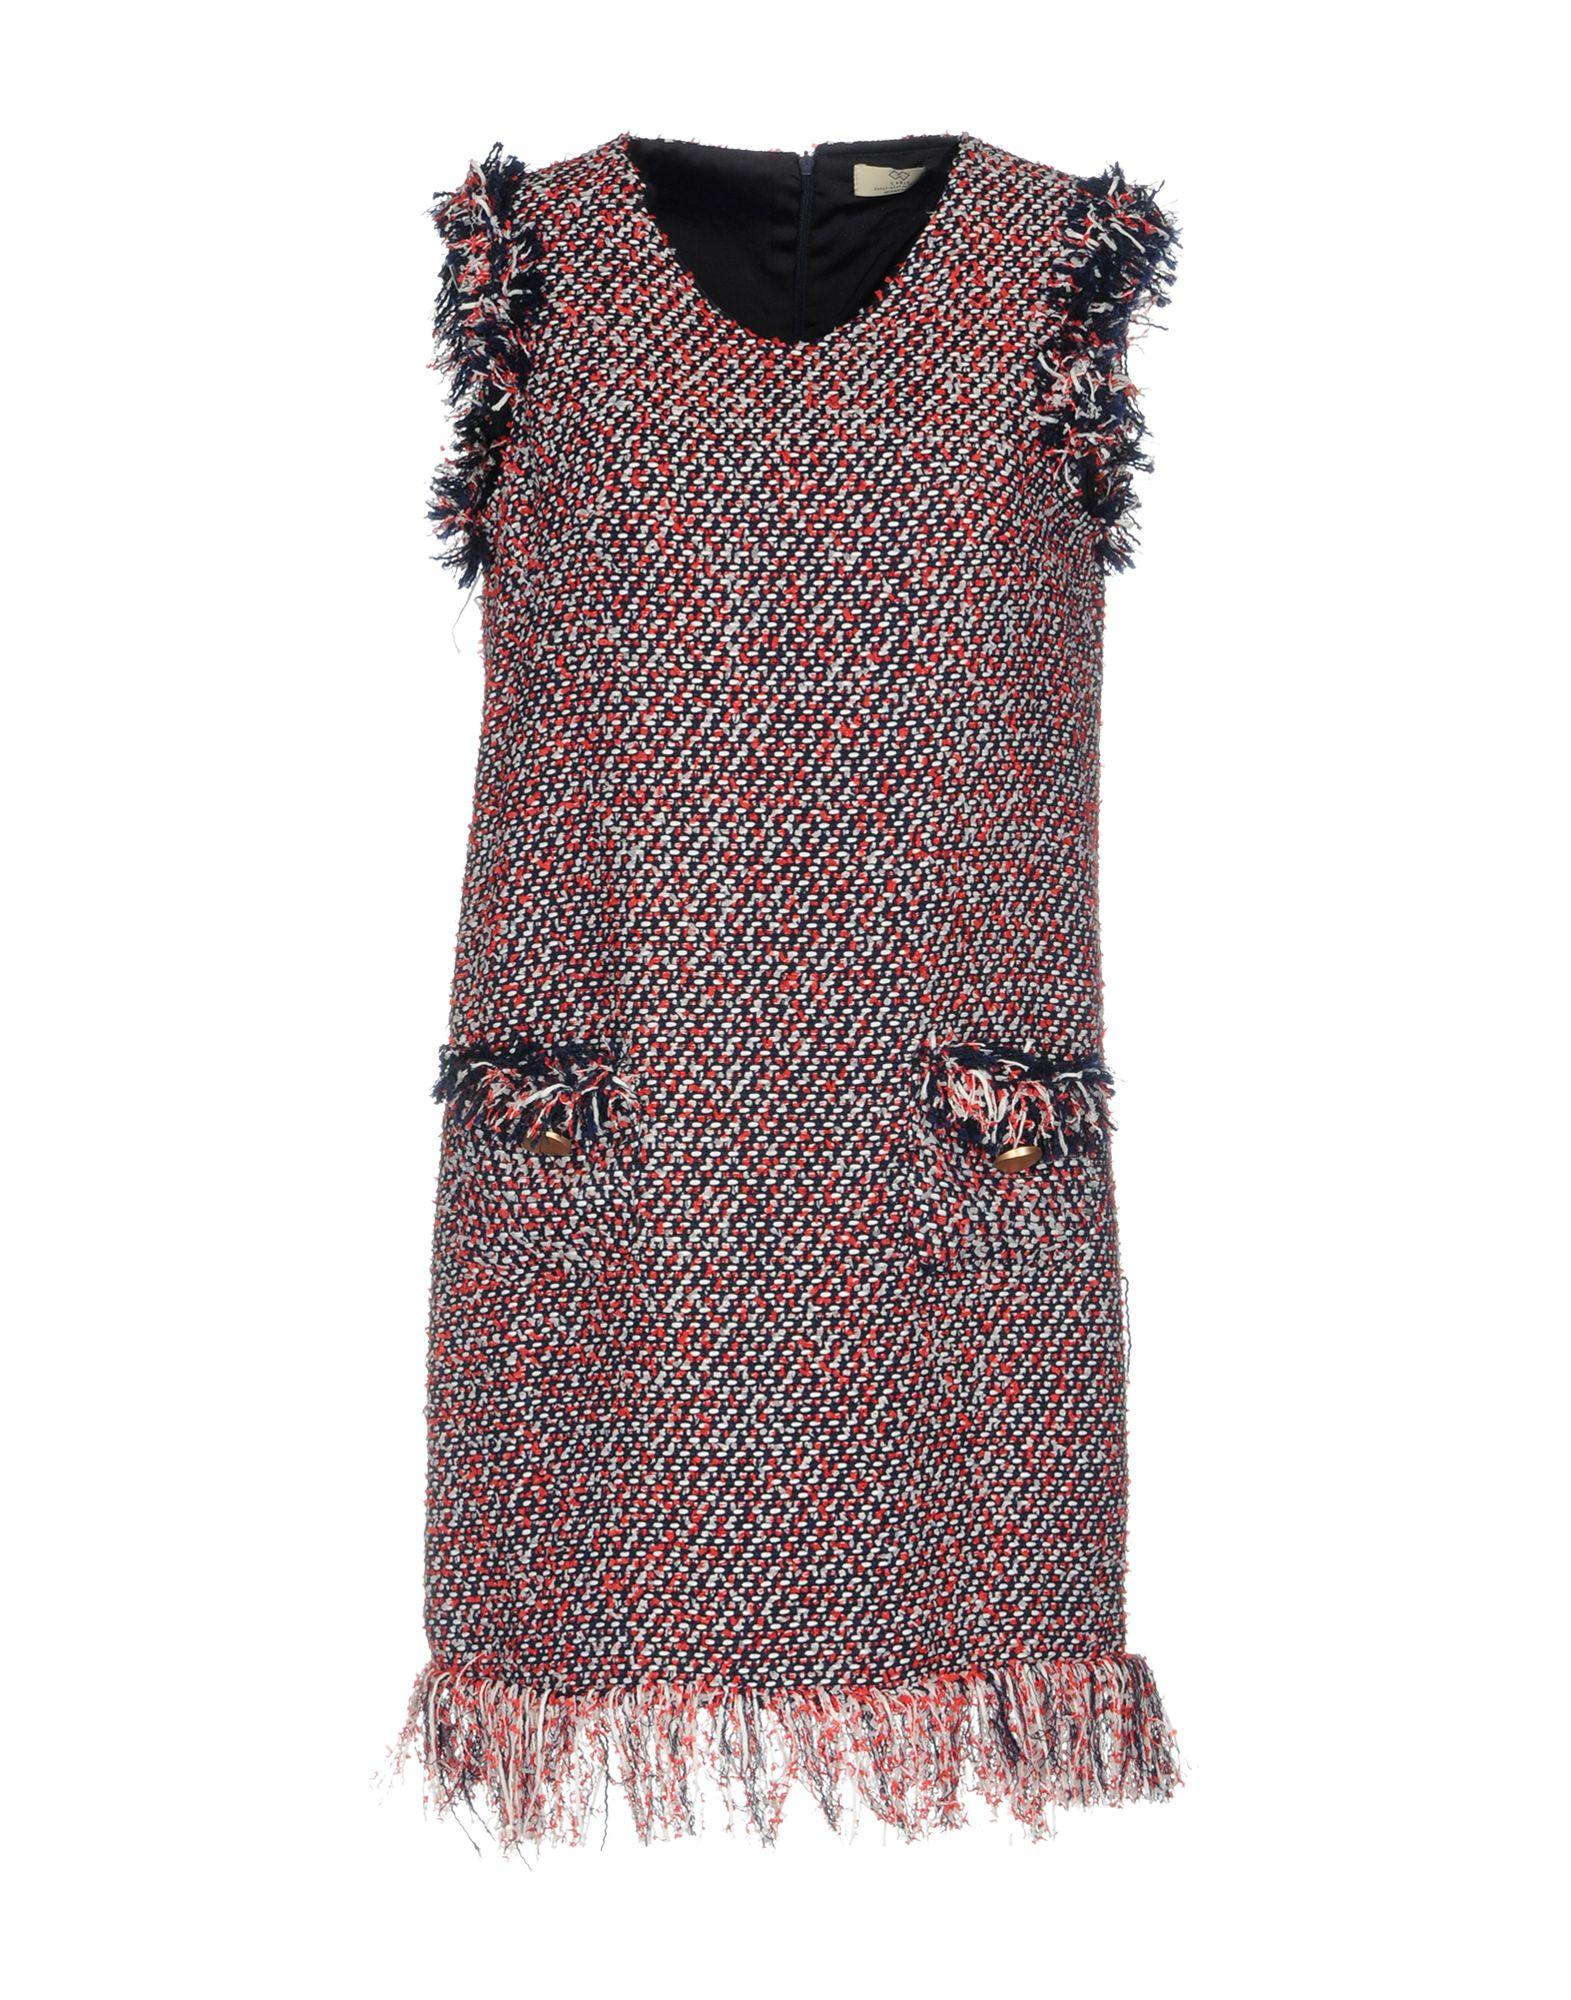 CUBIC Damen Kurzes Kleid Farbe Rot Größe 5